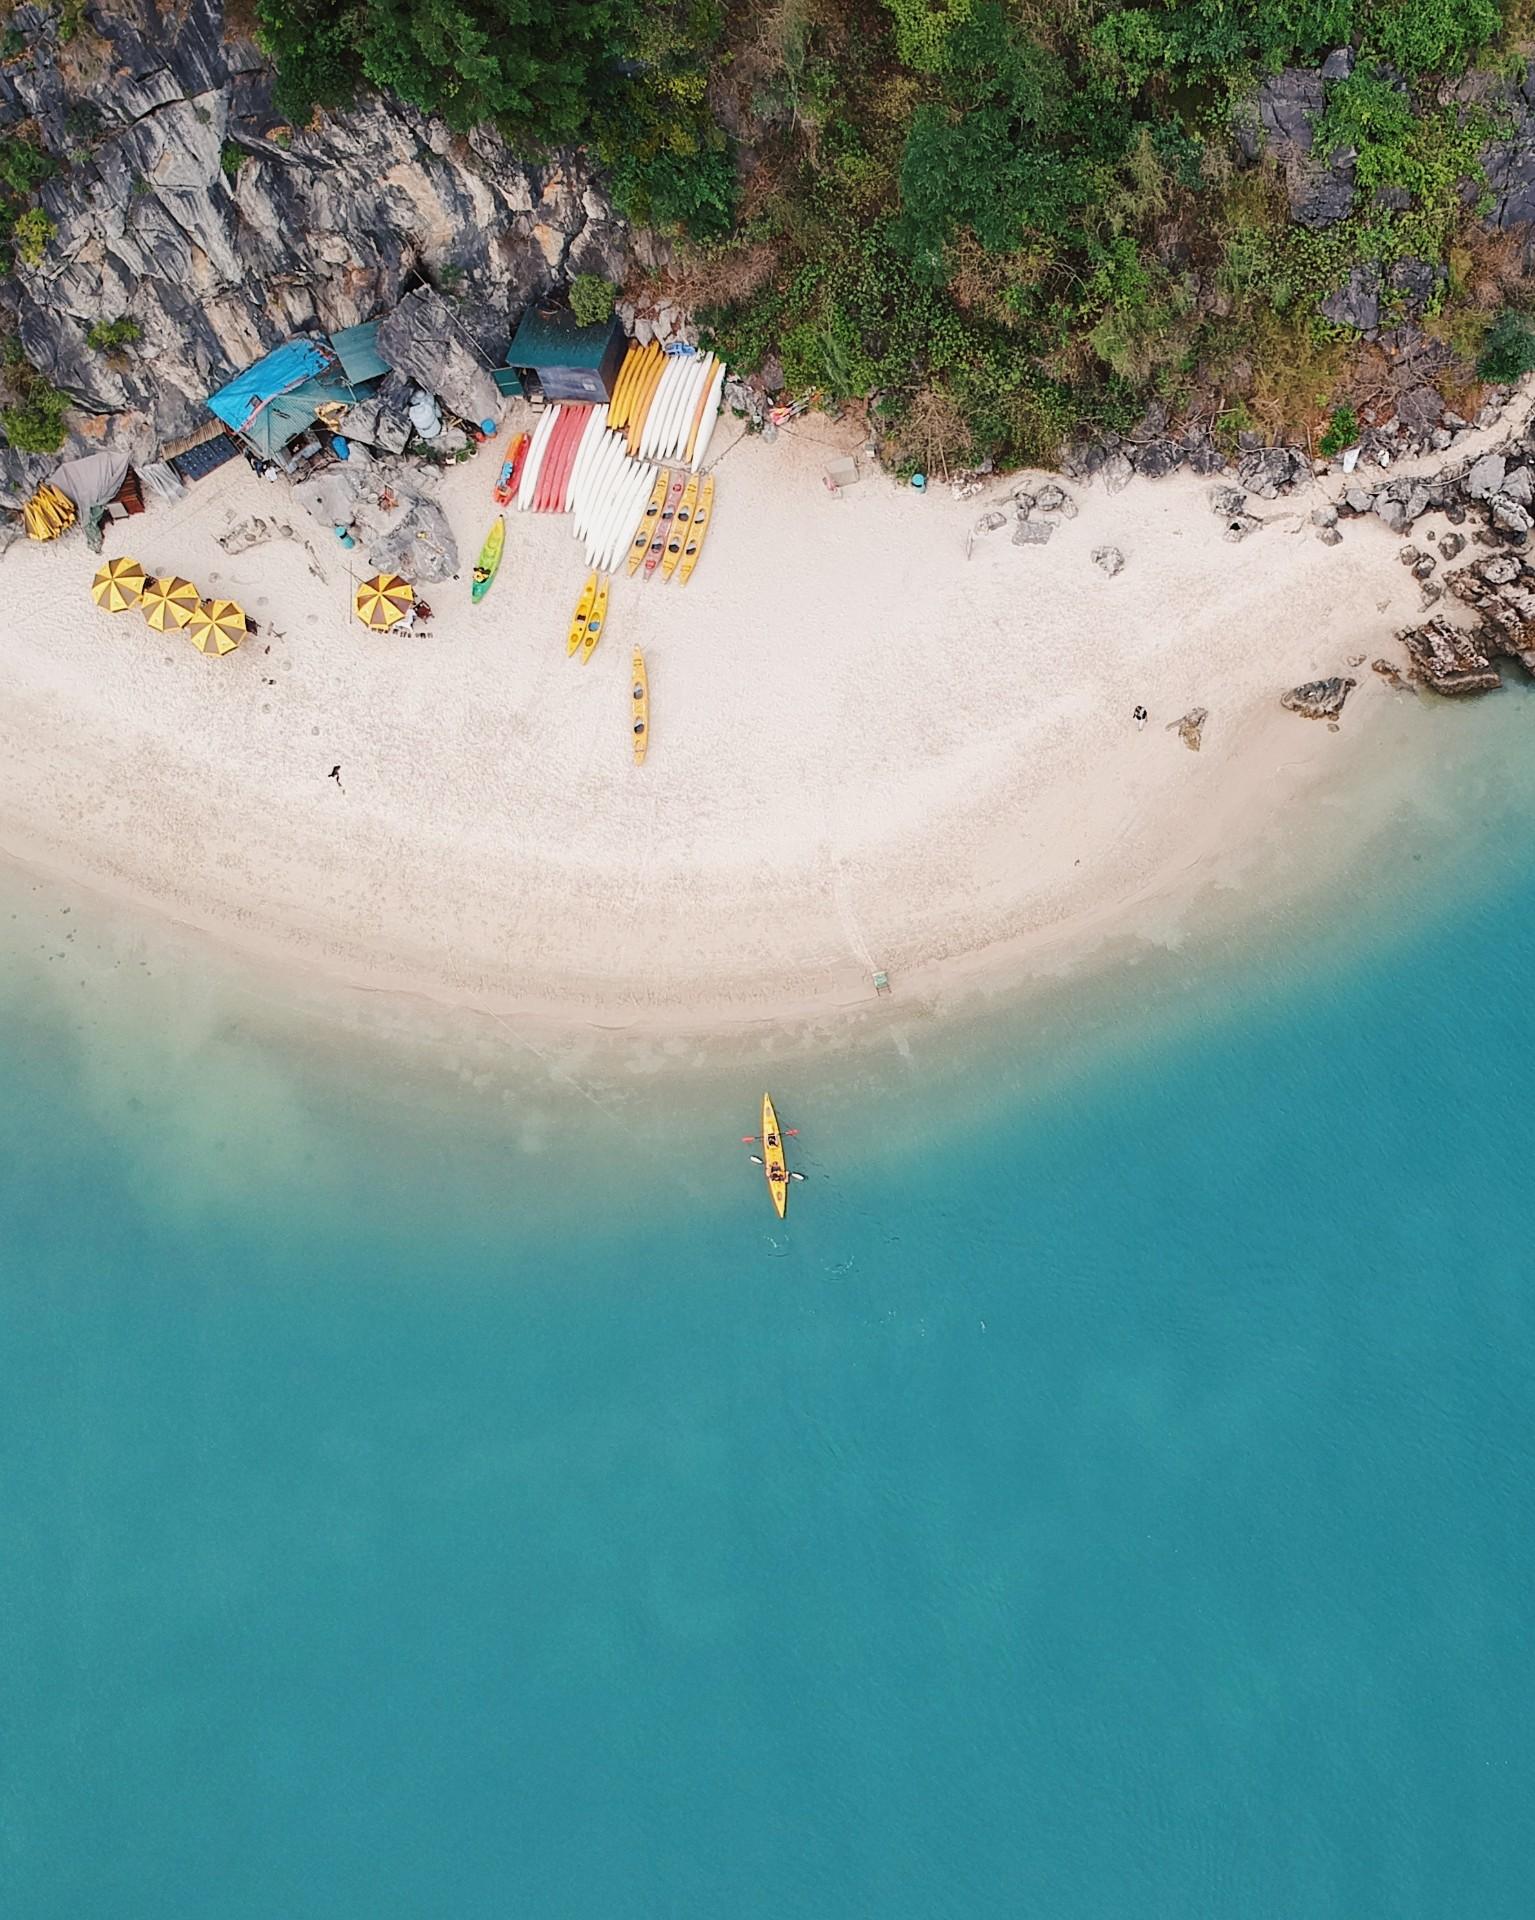 Bai Tu Long Bay - Photo byTaylor SimpsononUnsplash